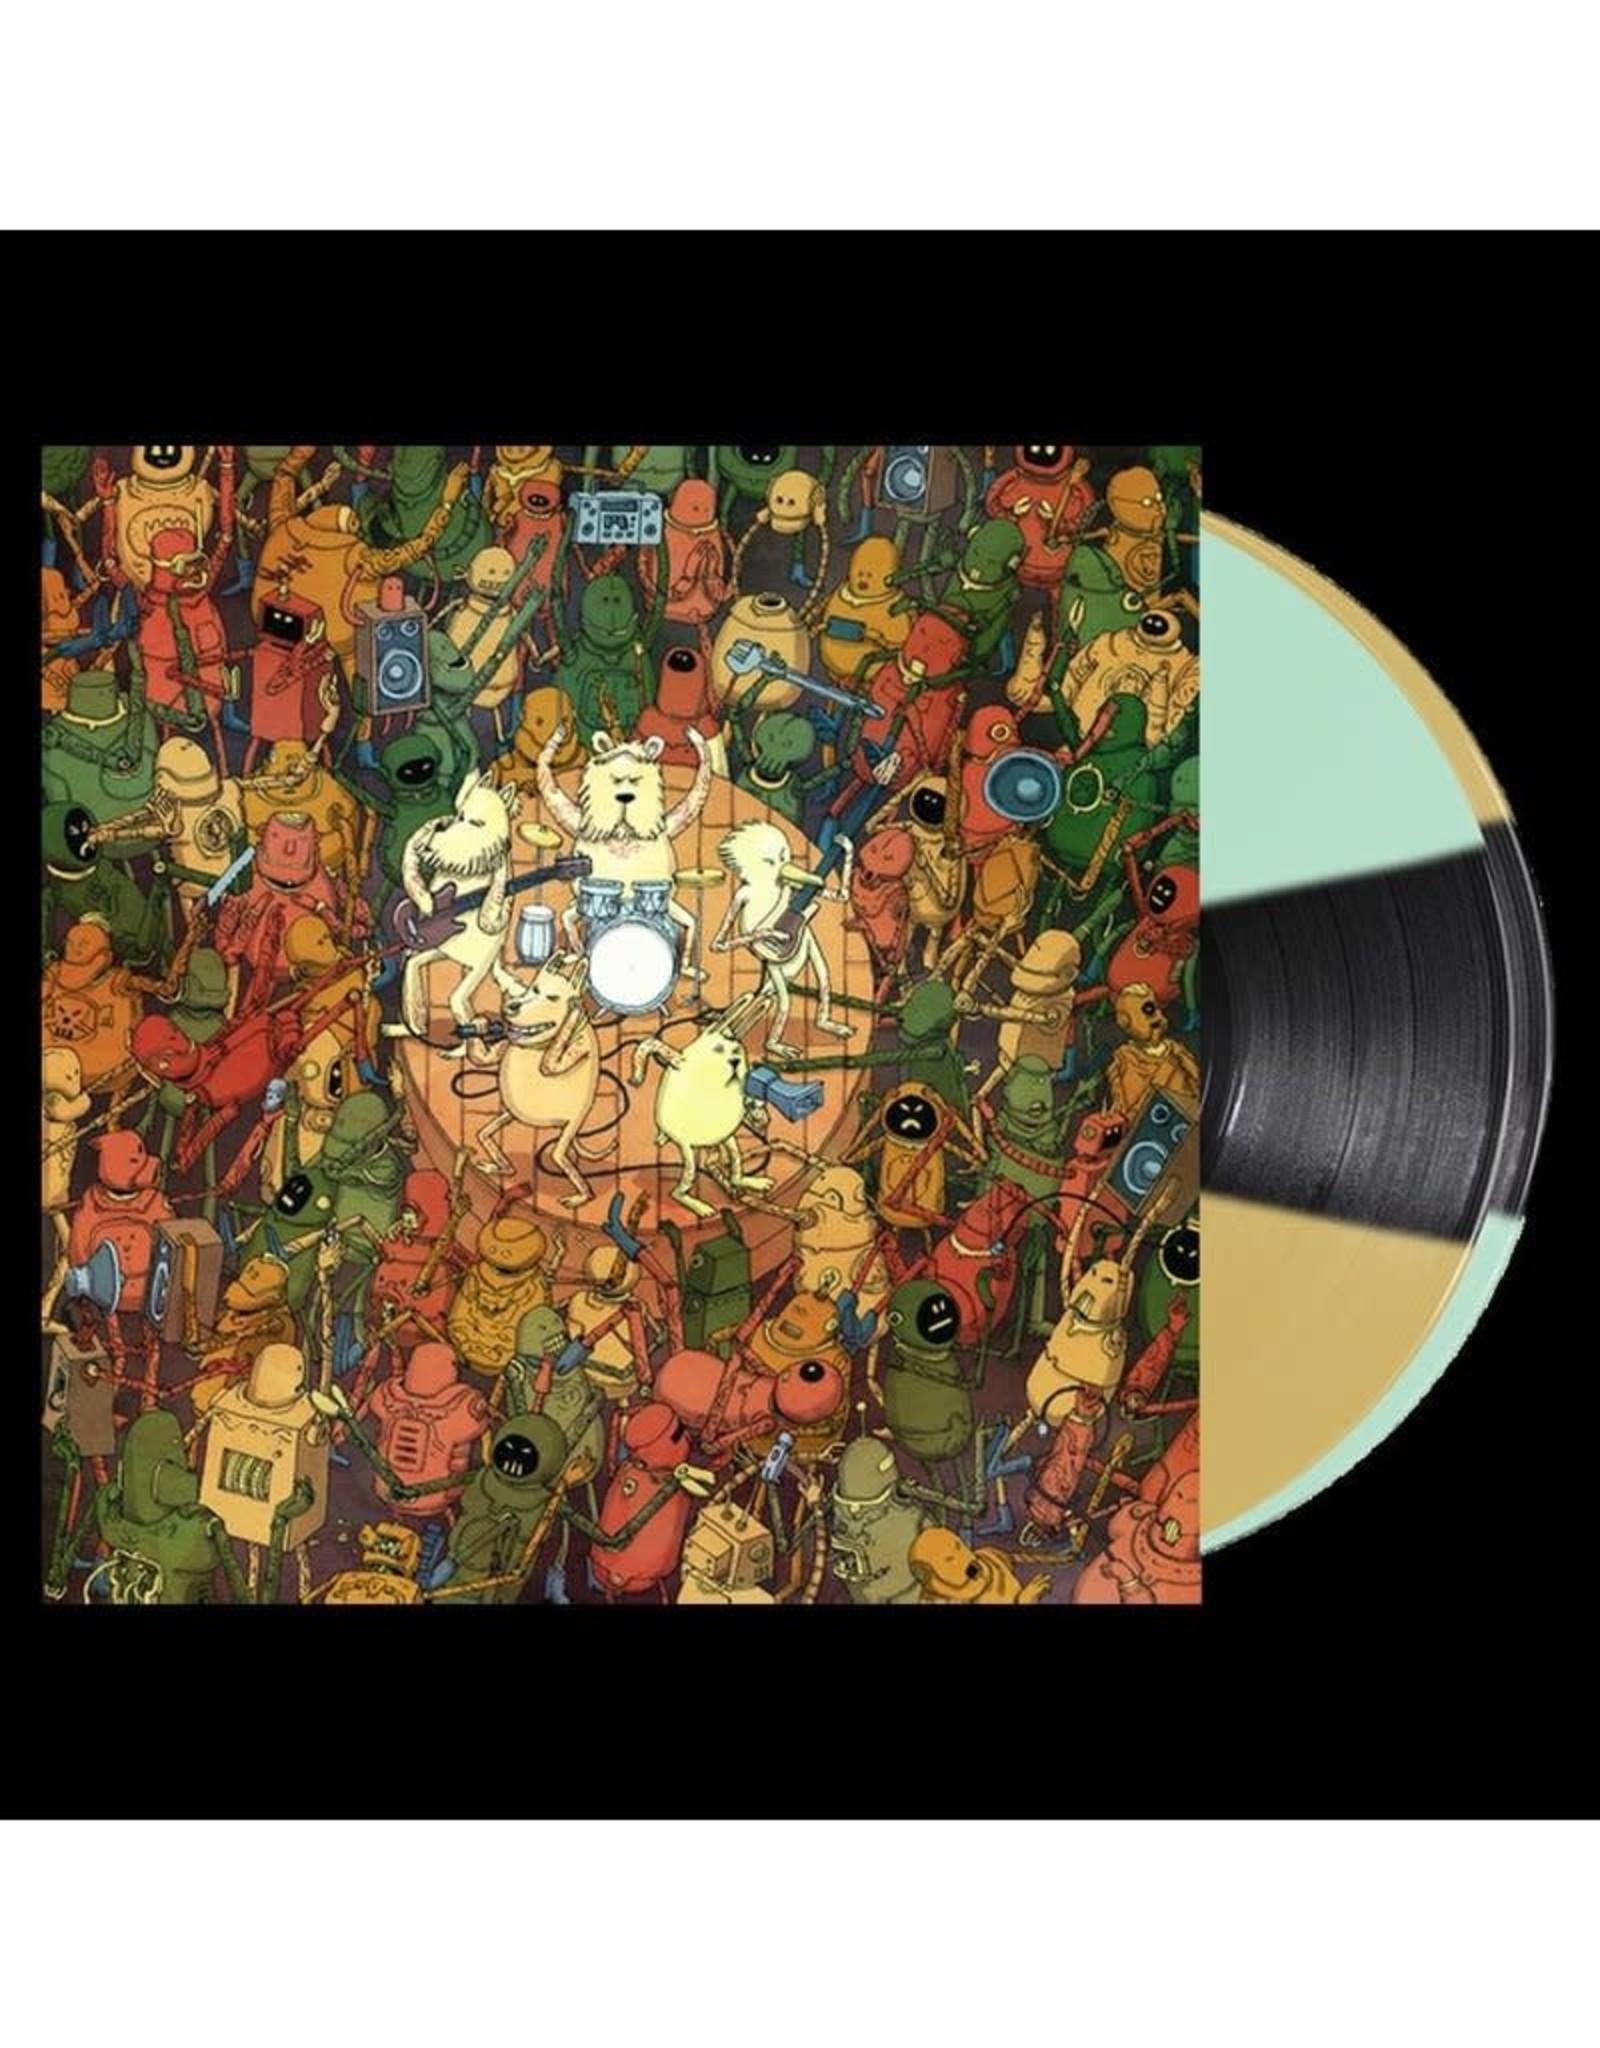 Dance Gavin Dance - Tree City Sessions 2 LP (Ltd. Tri-Colour Vinyl)